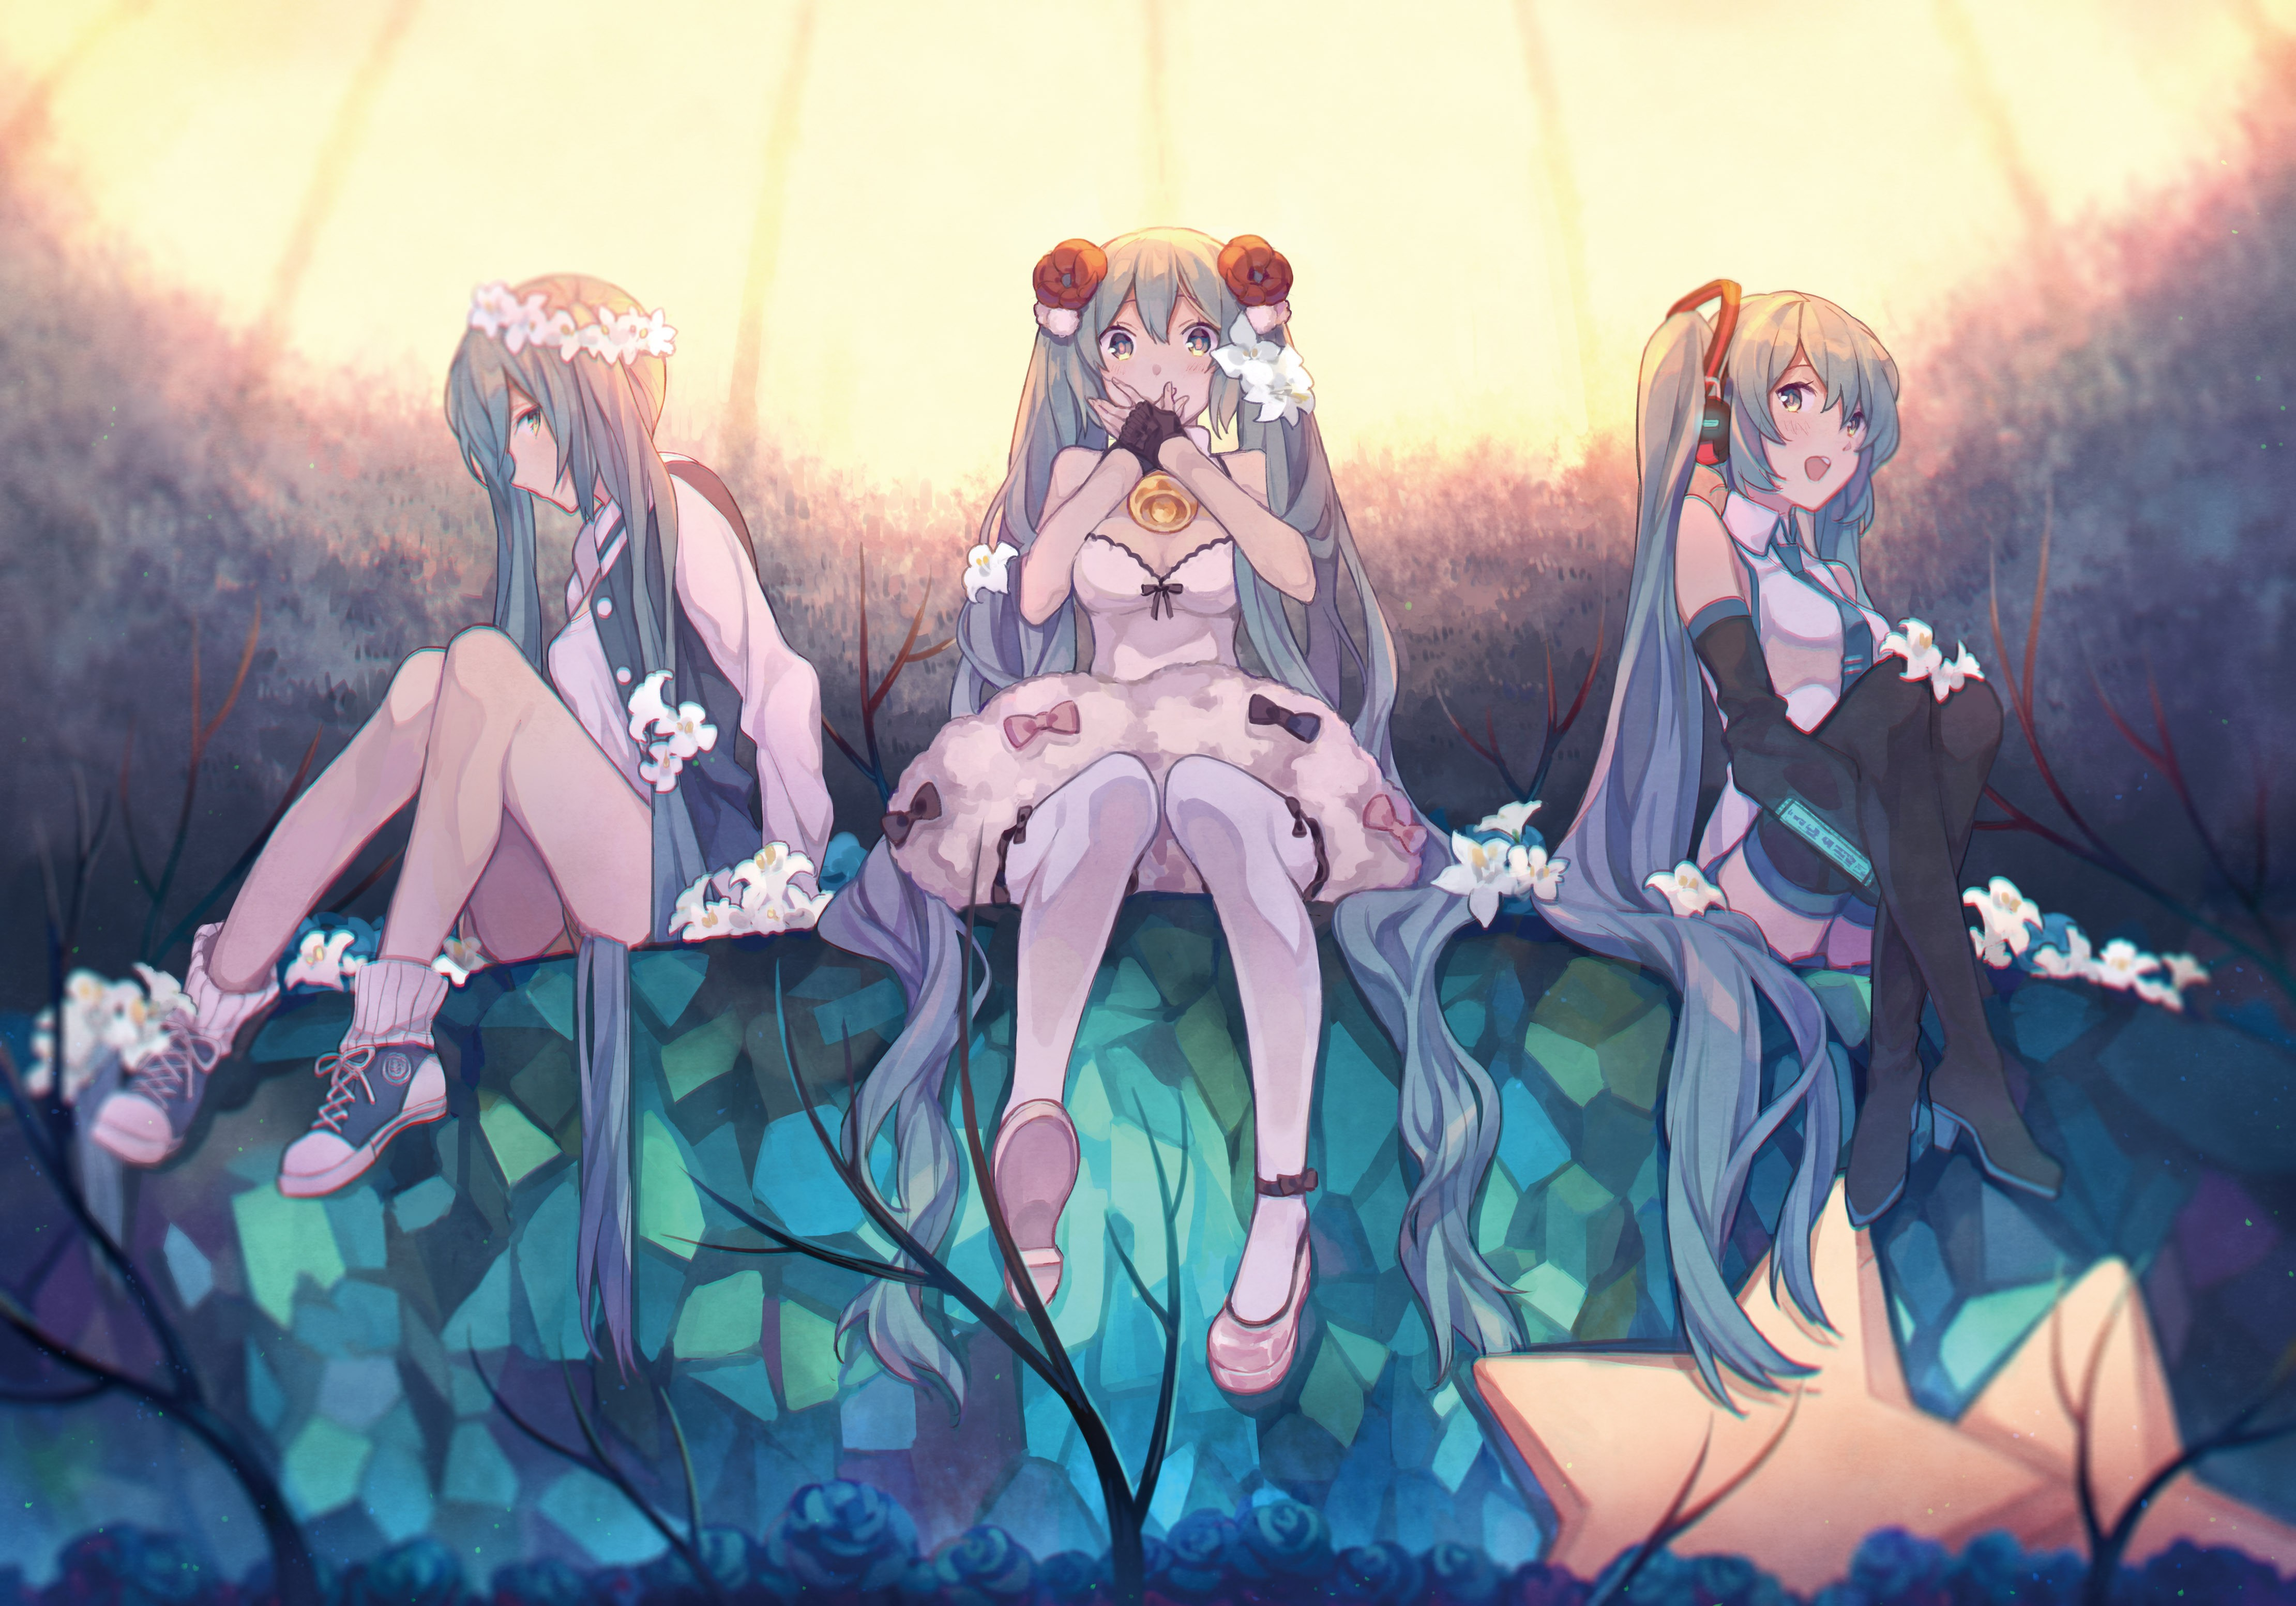 Anime 4440x3106 thigh-highs Vocaloid Hatsune Miku anime girls long hair flowers twintails